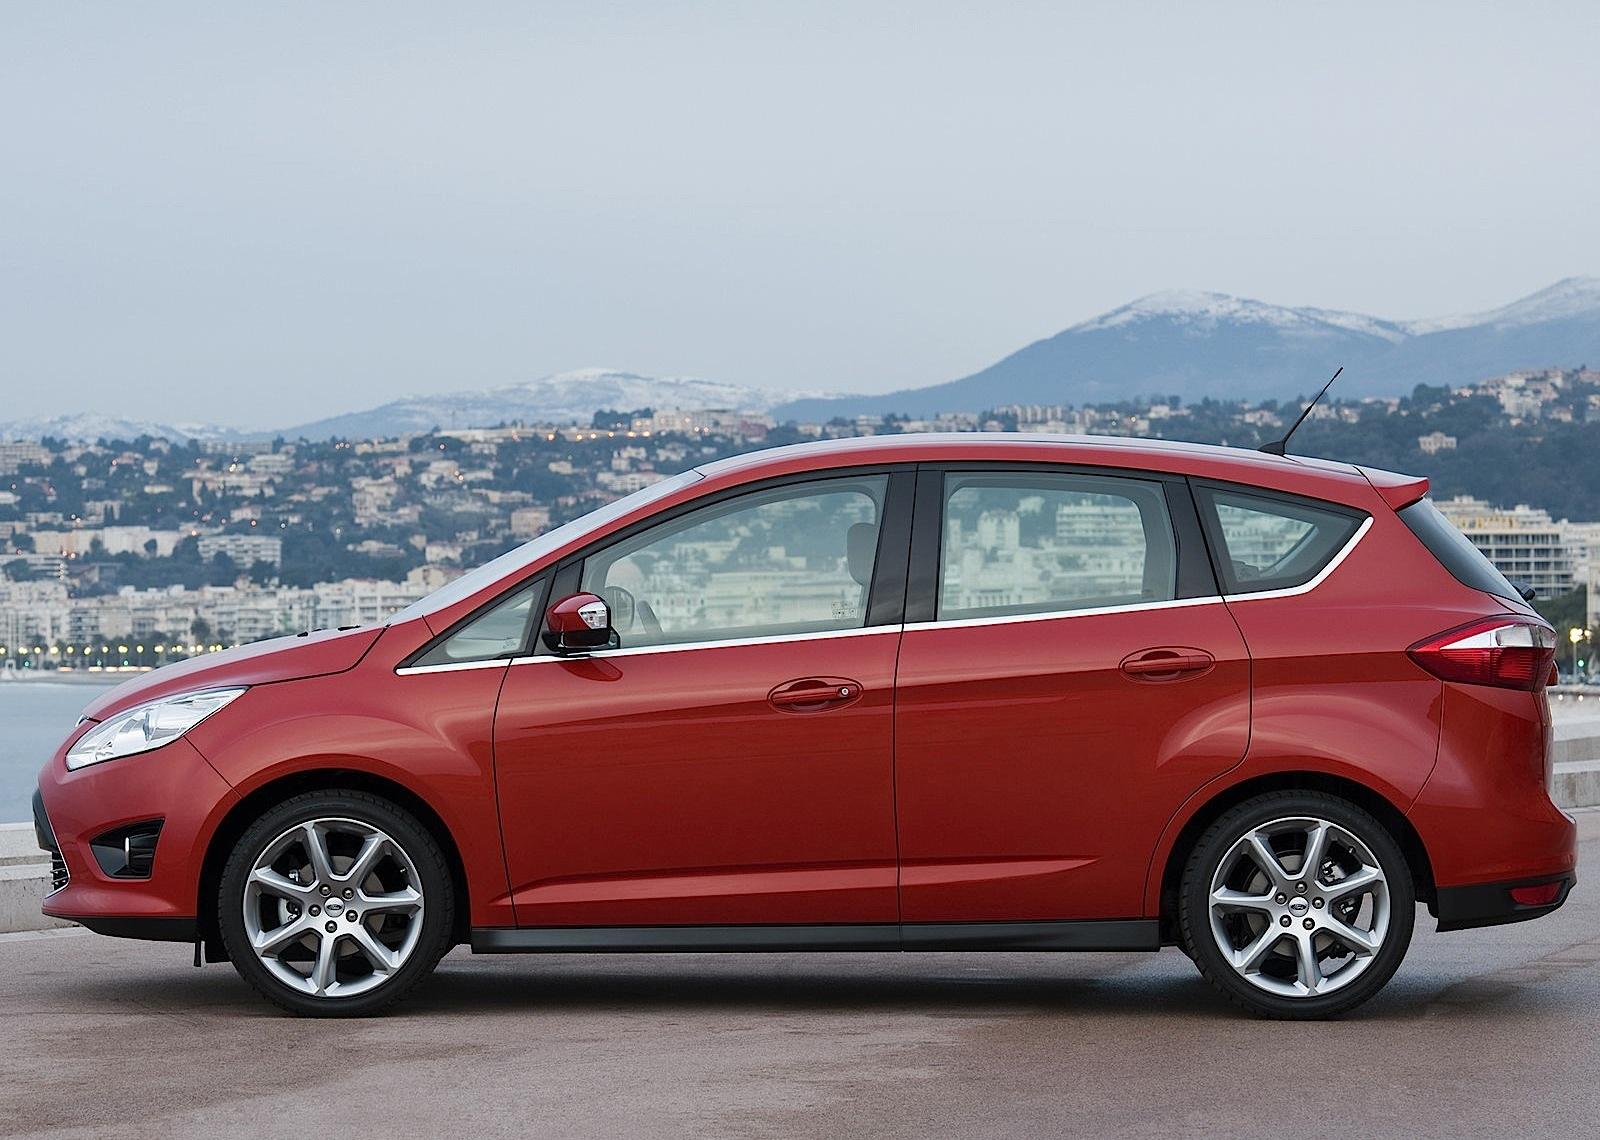 Ford Grand C Max 2.0 Tdci >> FORD C-Max specs & photos - 2010, 2011, 2012, 2013, 2014 - autoevolution